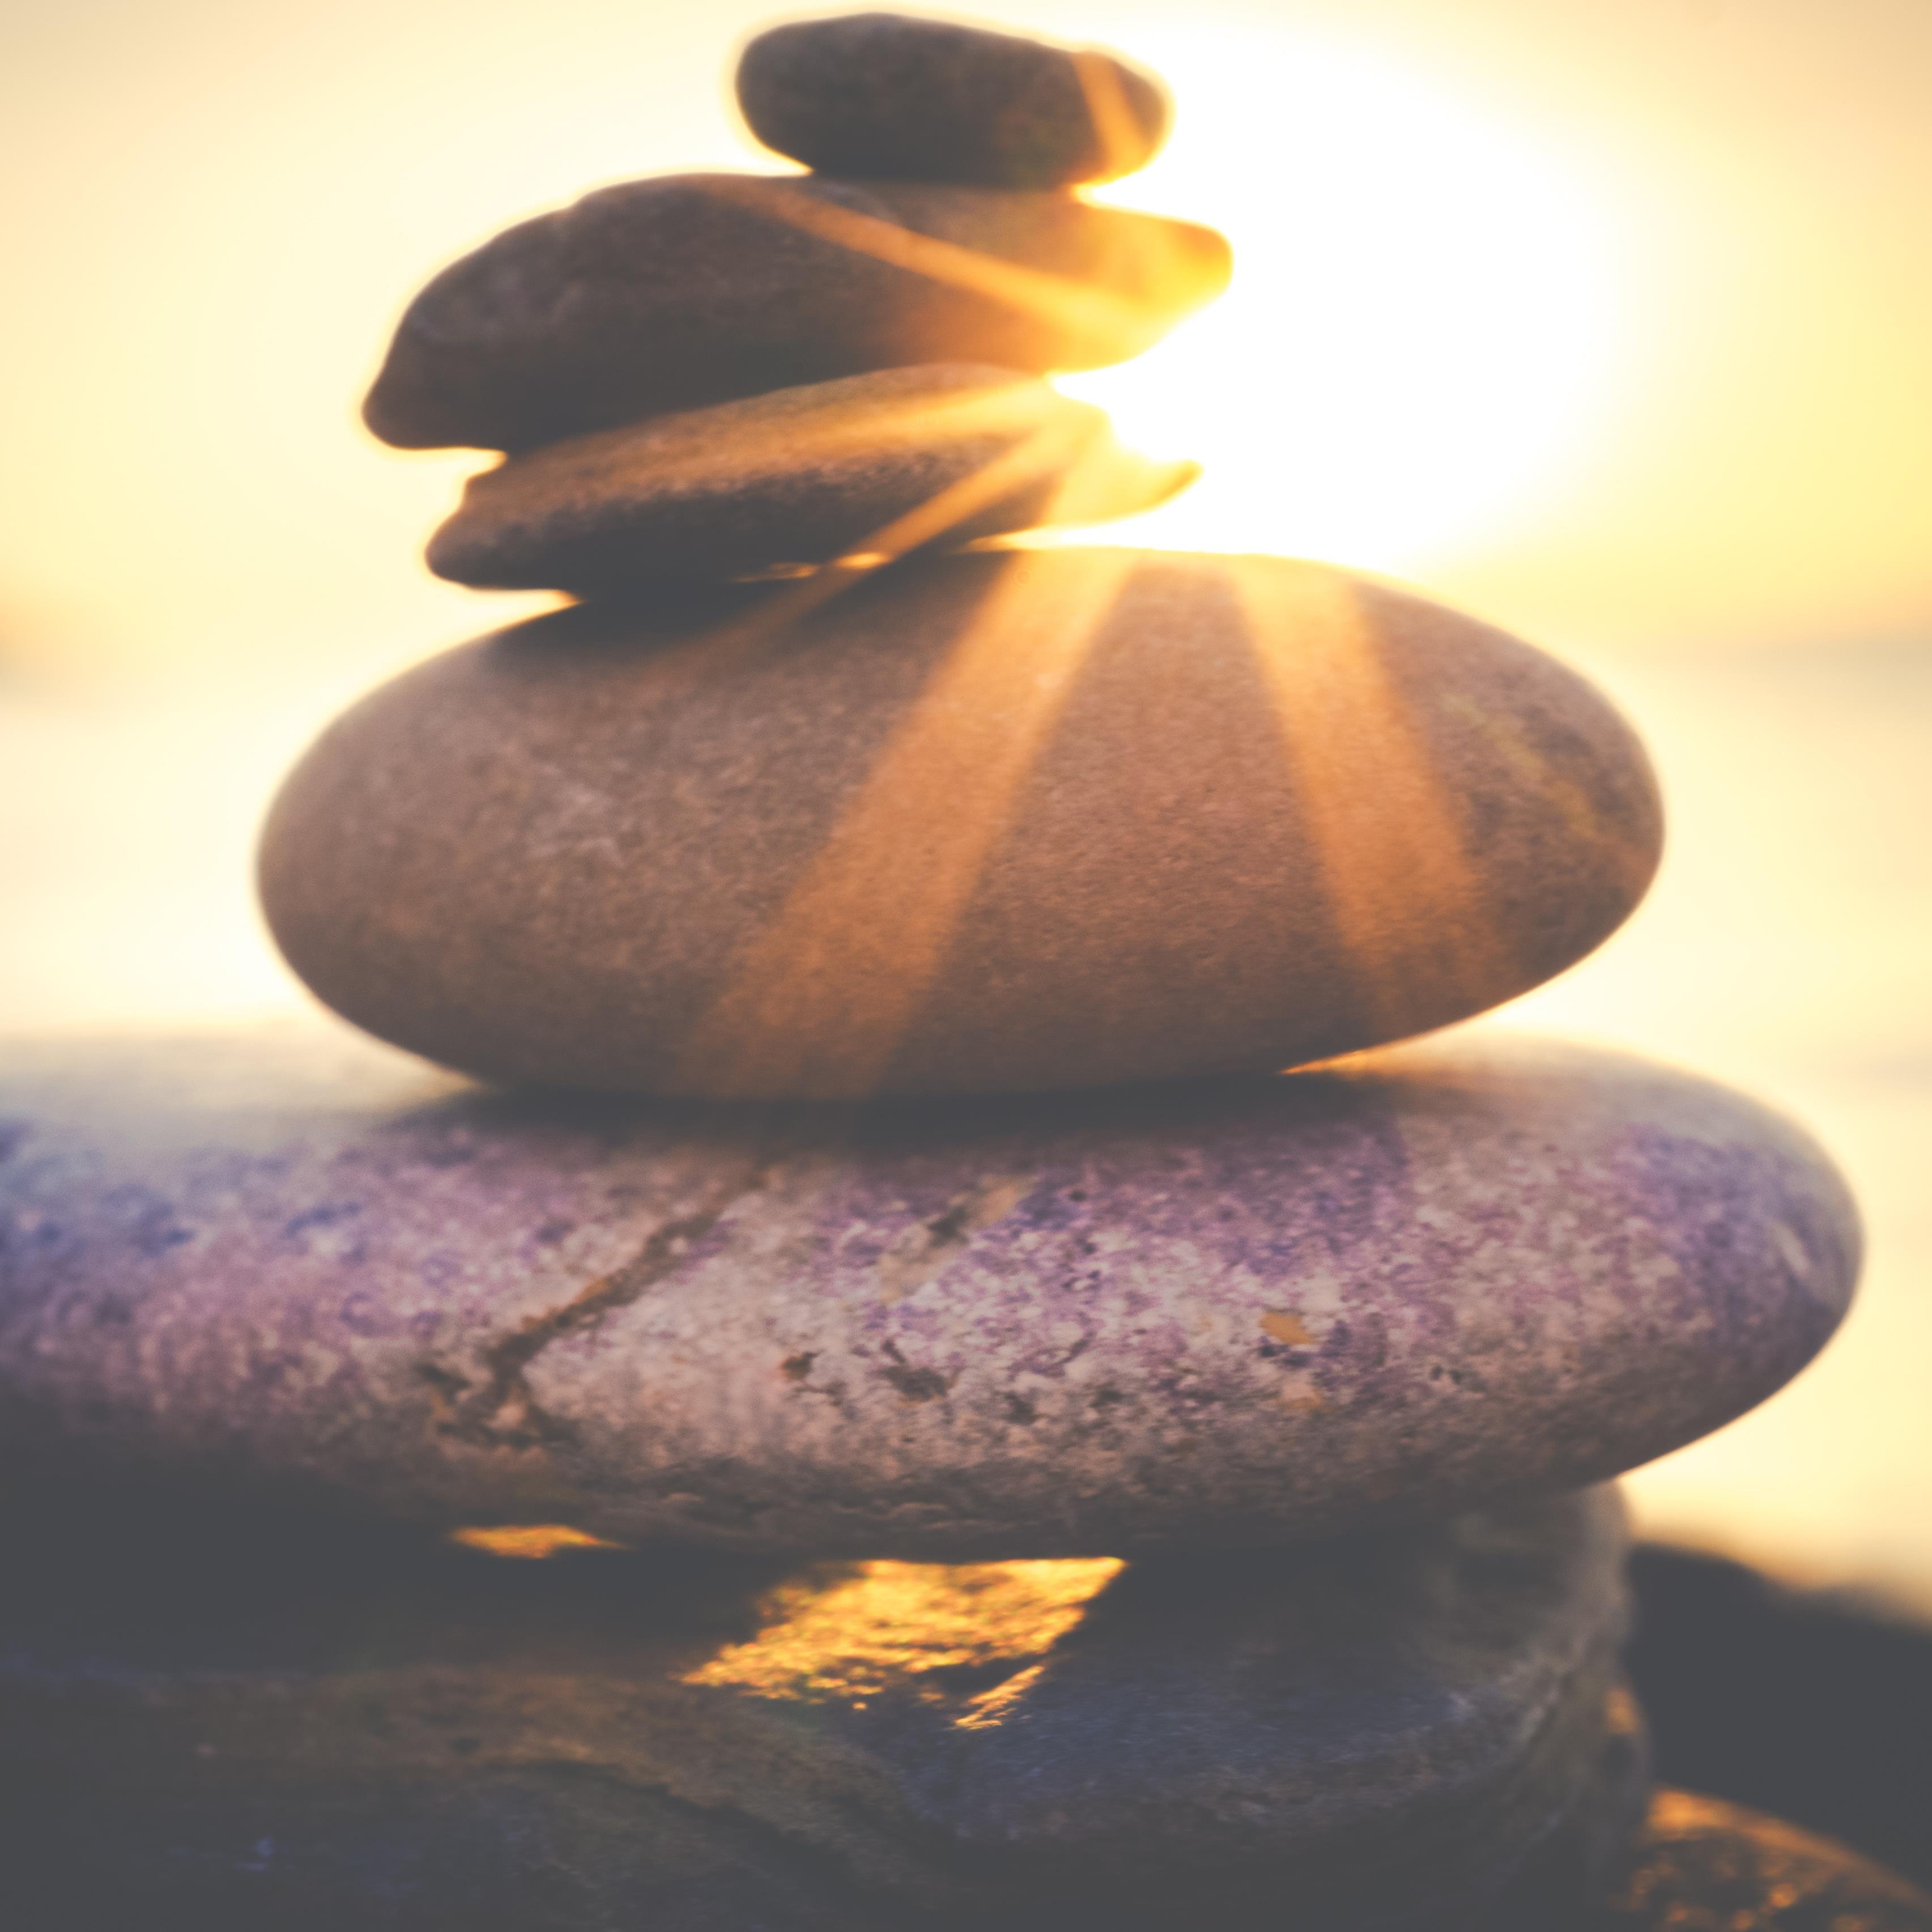 Meditation / Mindfulness